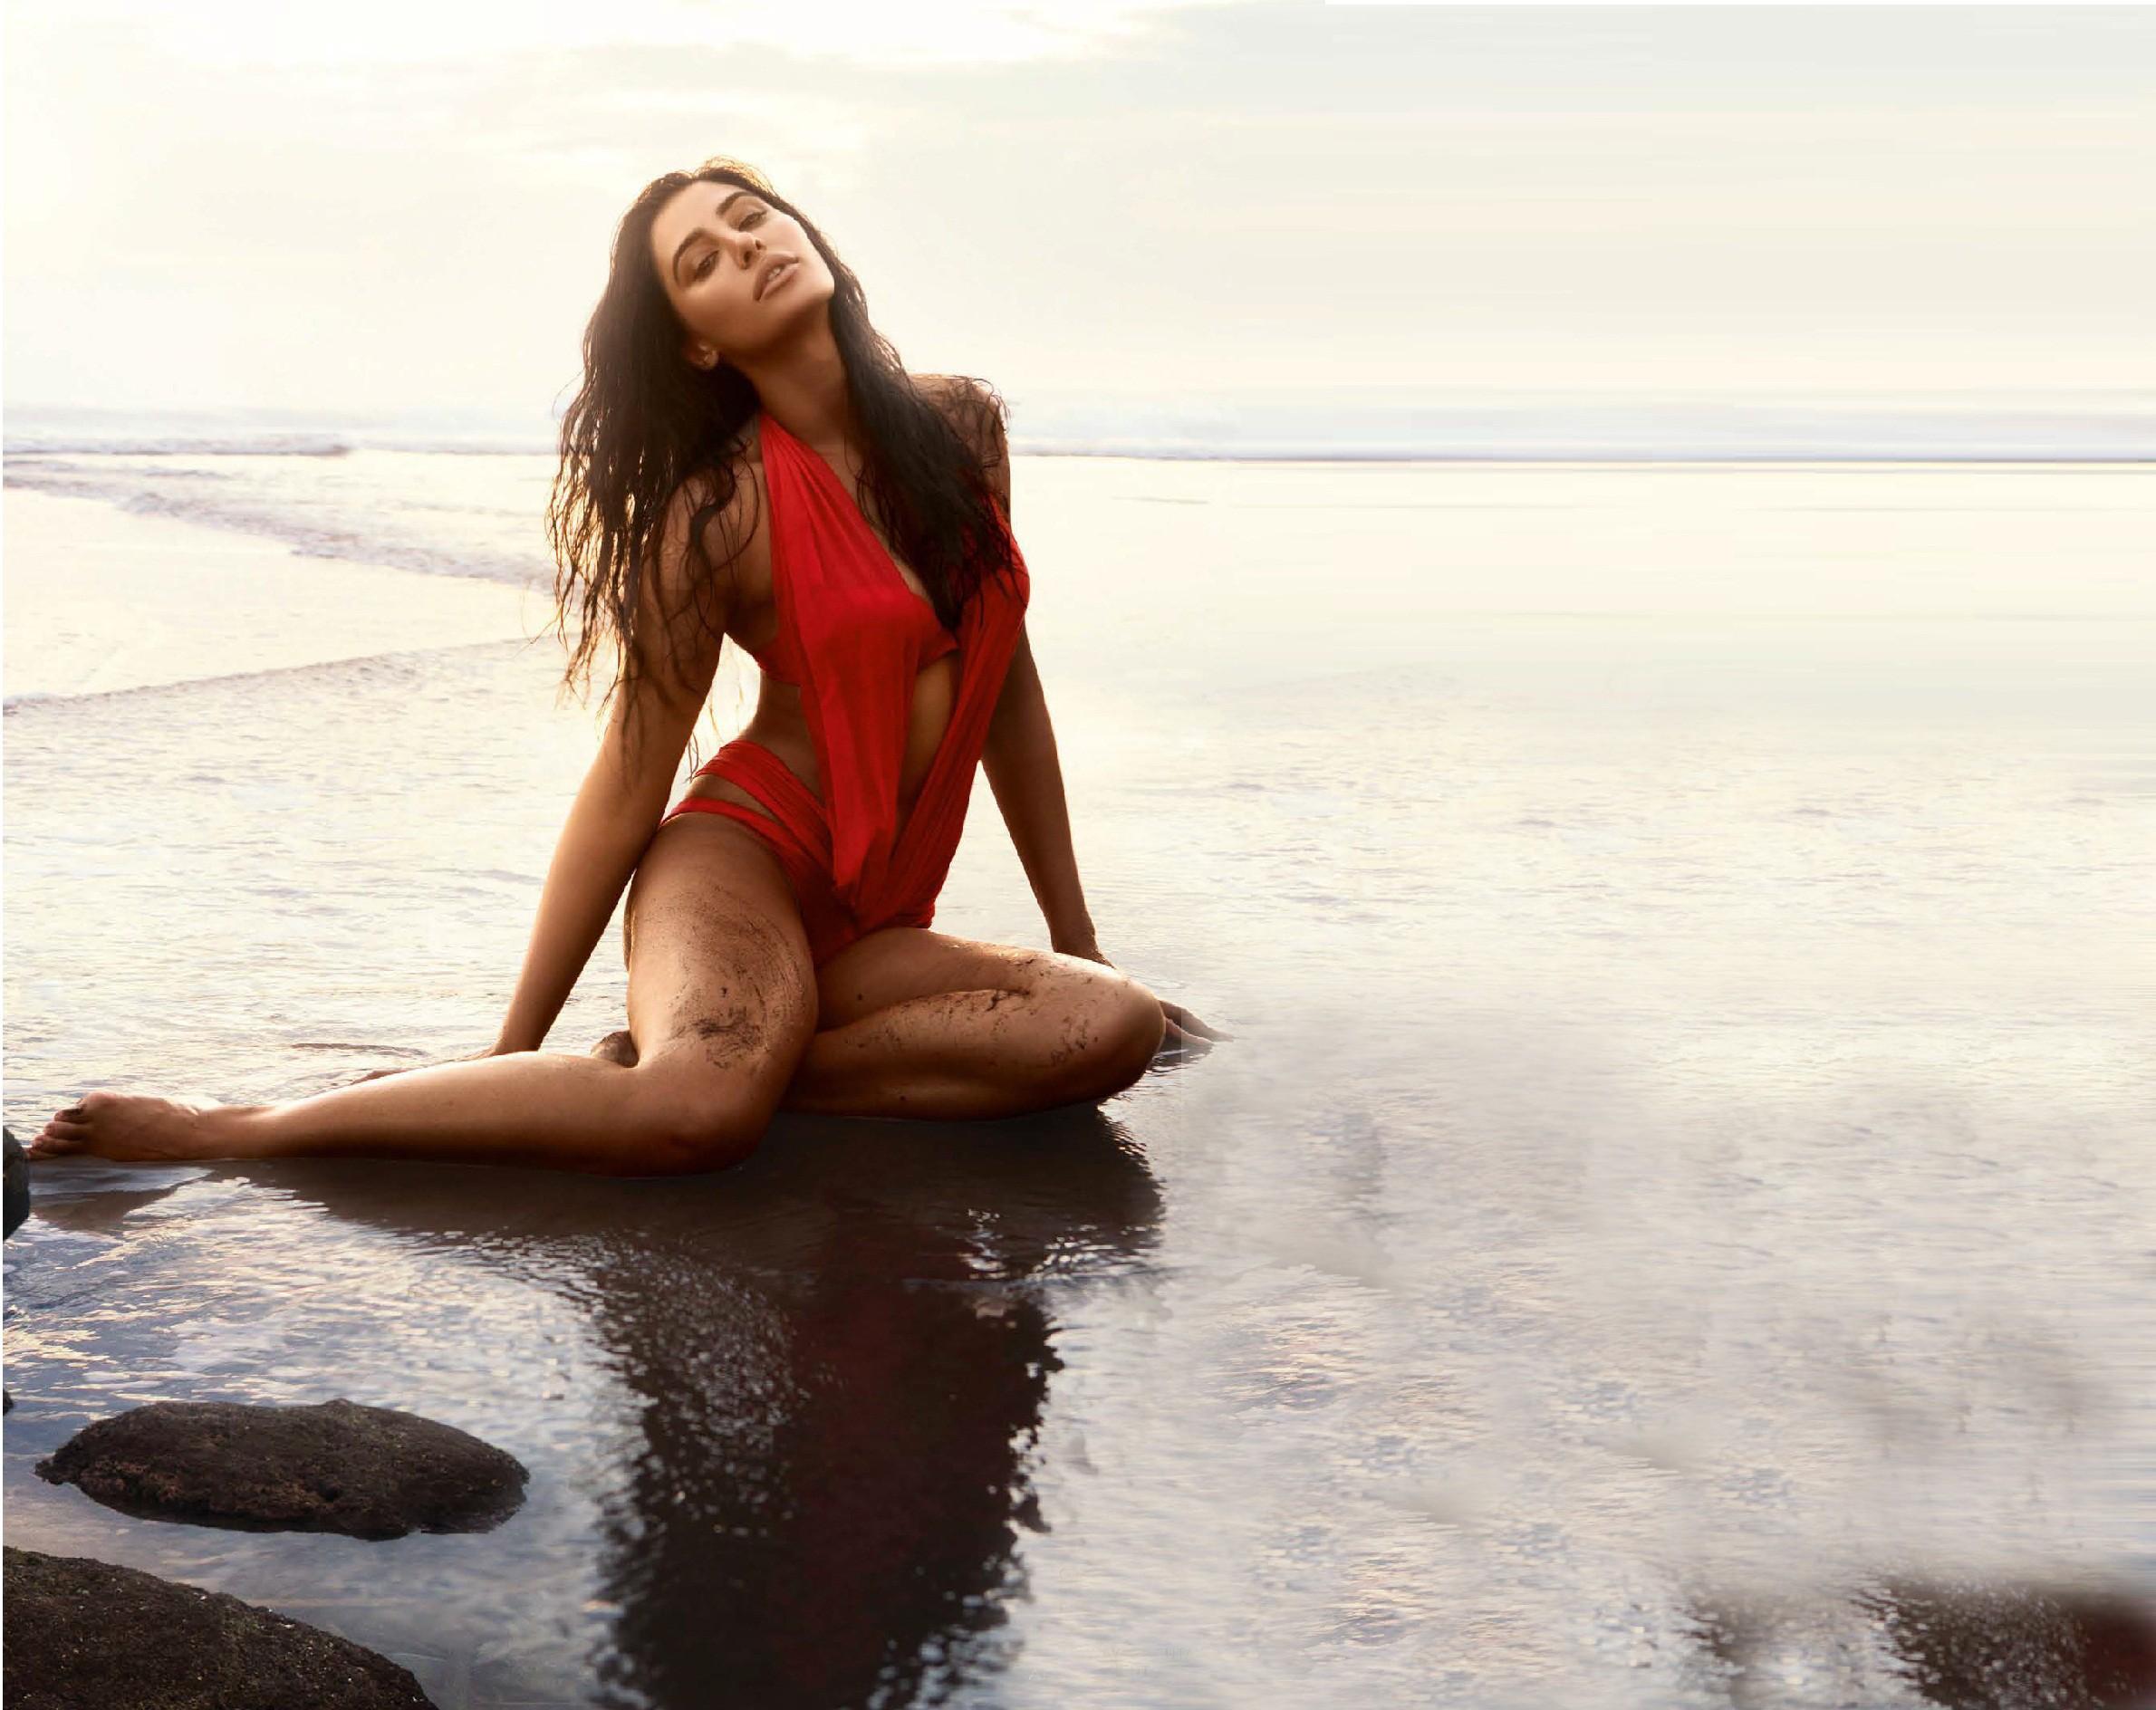 Hd swimsuit wallpaper wallpapersafari - Hd bikini wallpaper download ...